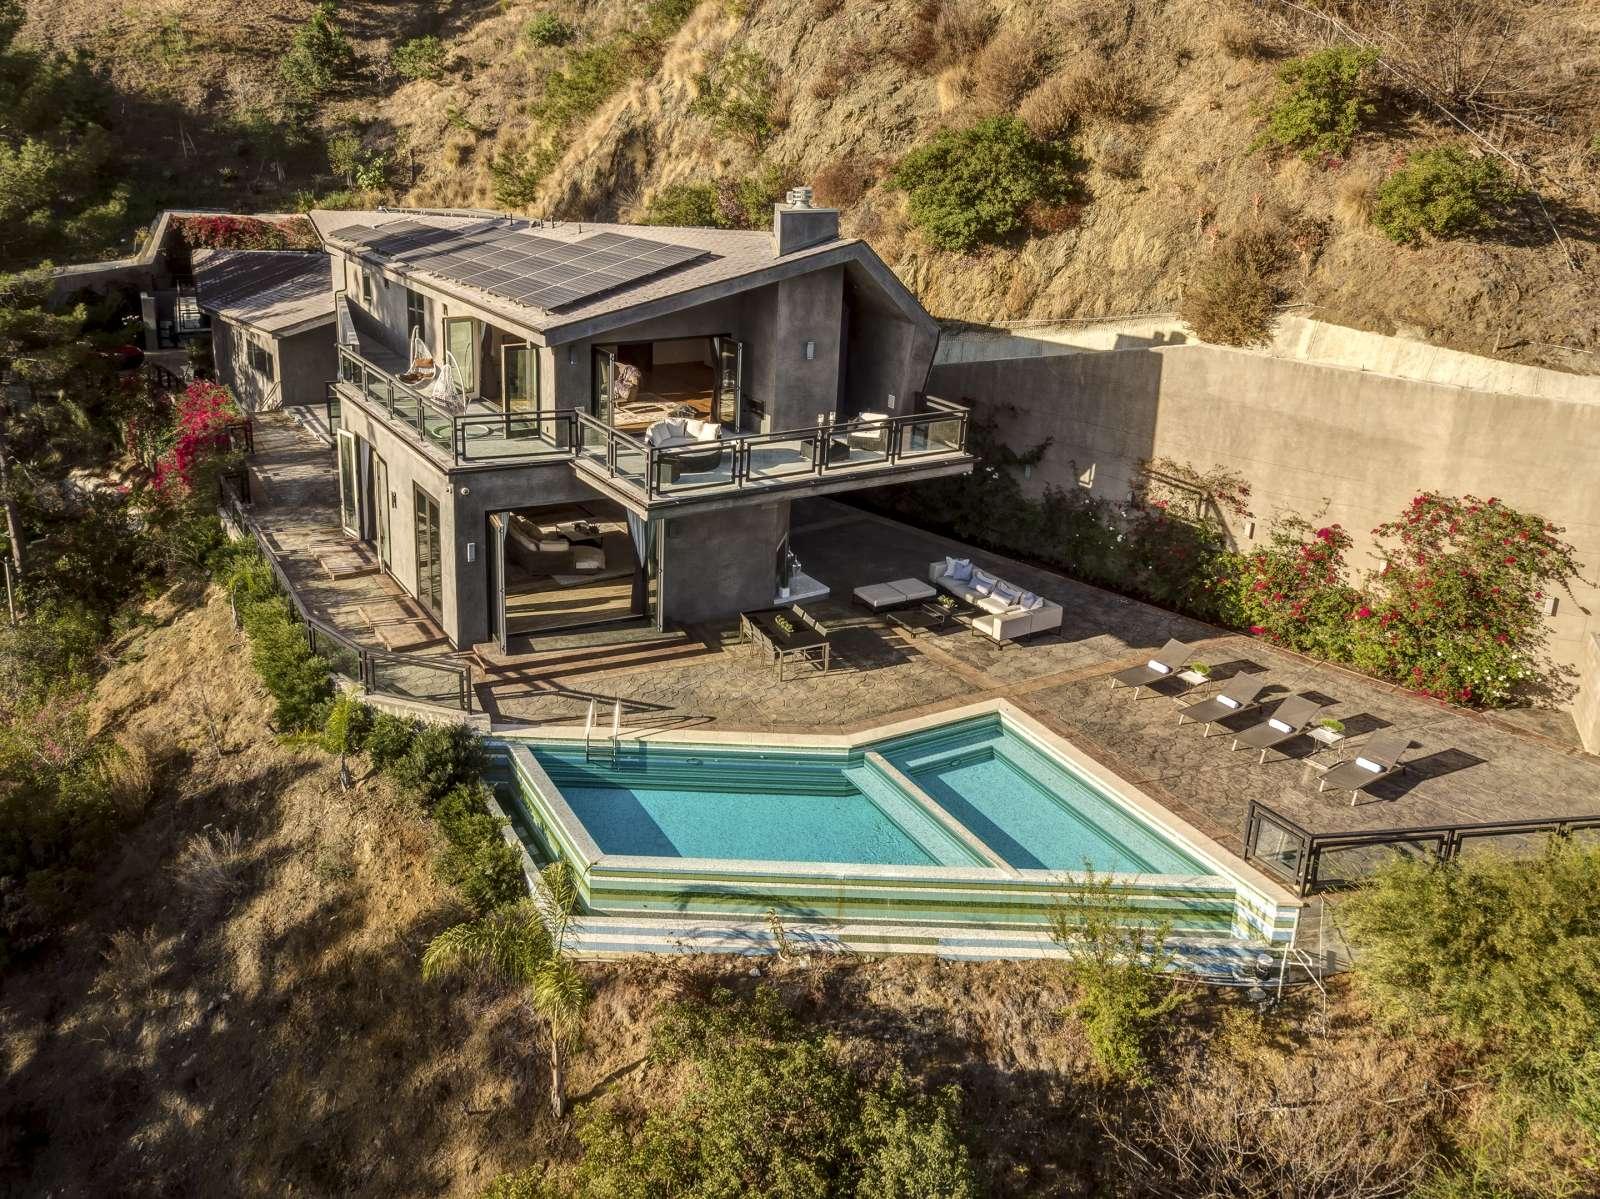 monte-cielo-house-archillusion-desgin-11.jpg